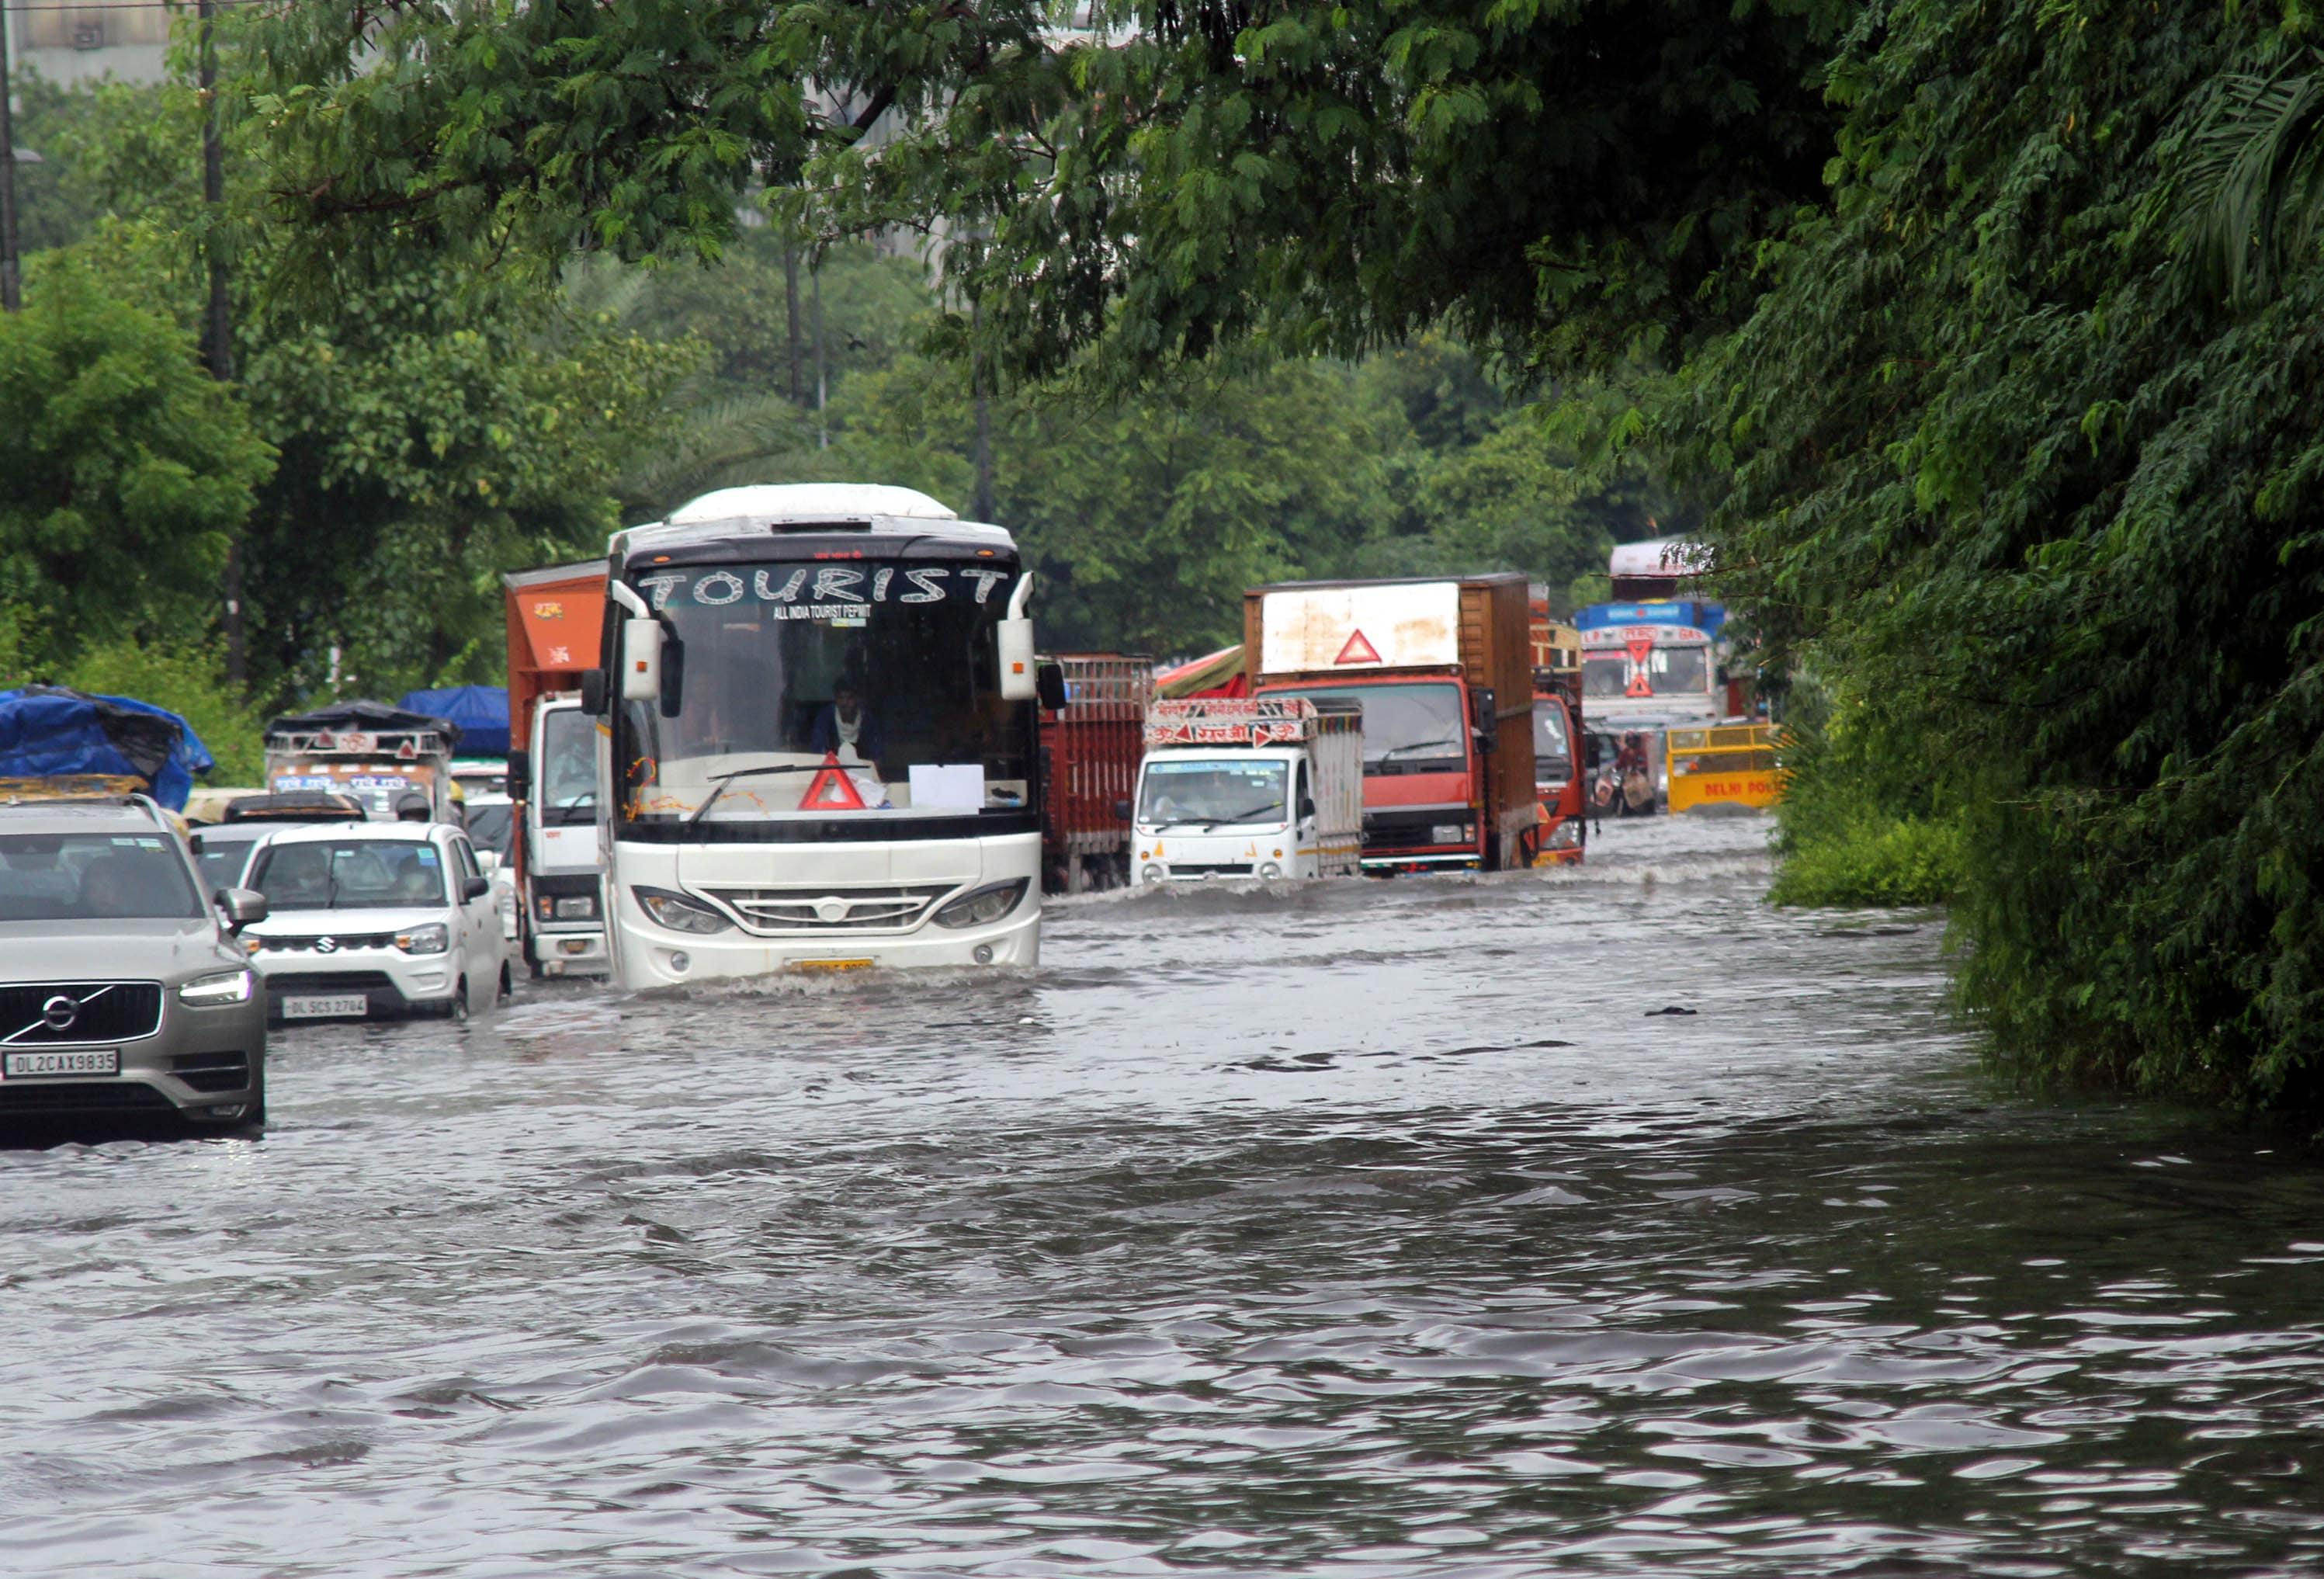 Other ares that faced water-logging include Vikas Marg, Sangam Vihar, Mehrauli-Badarpur Road, Pul Prahladpur Underpass, Mahipalpur, Munirka, Rajpur Khurd, Nangloi and Kirari, among others.